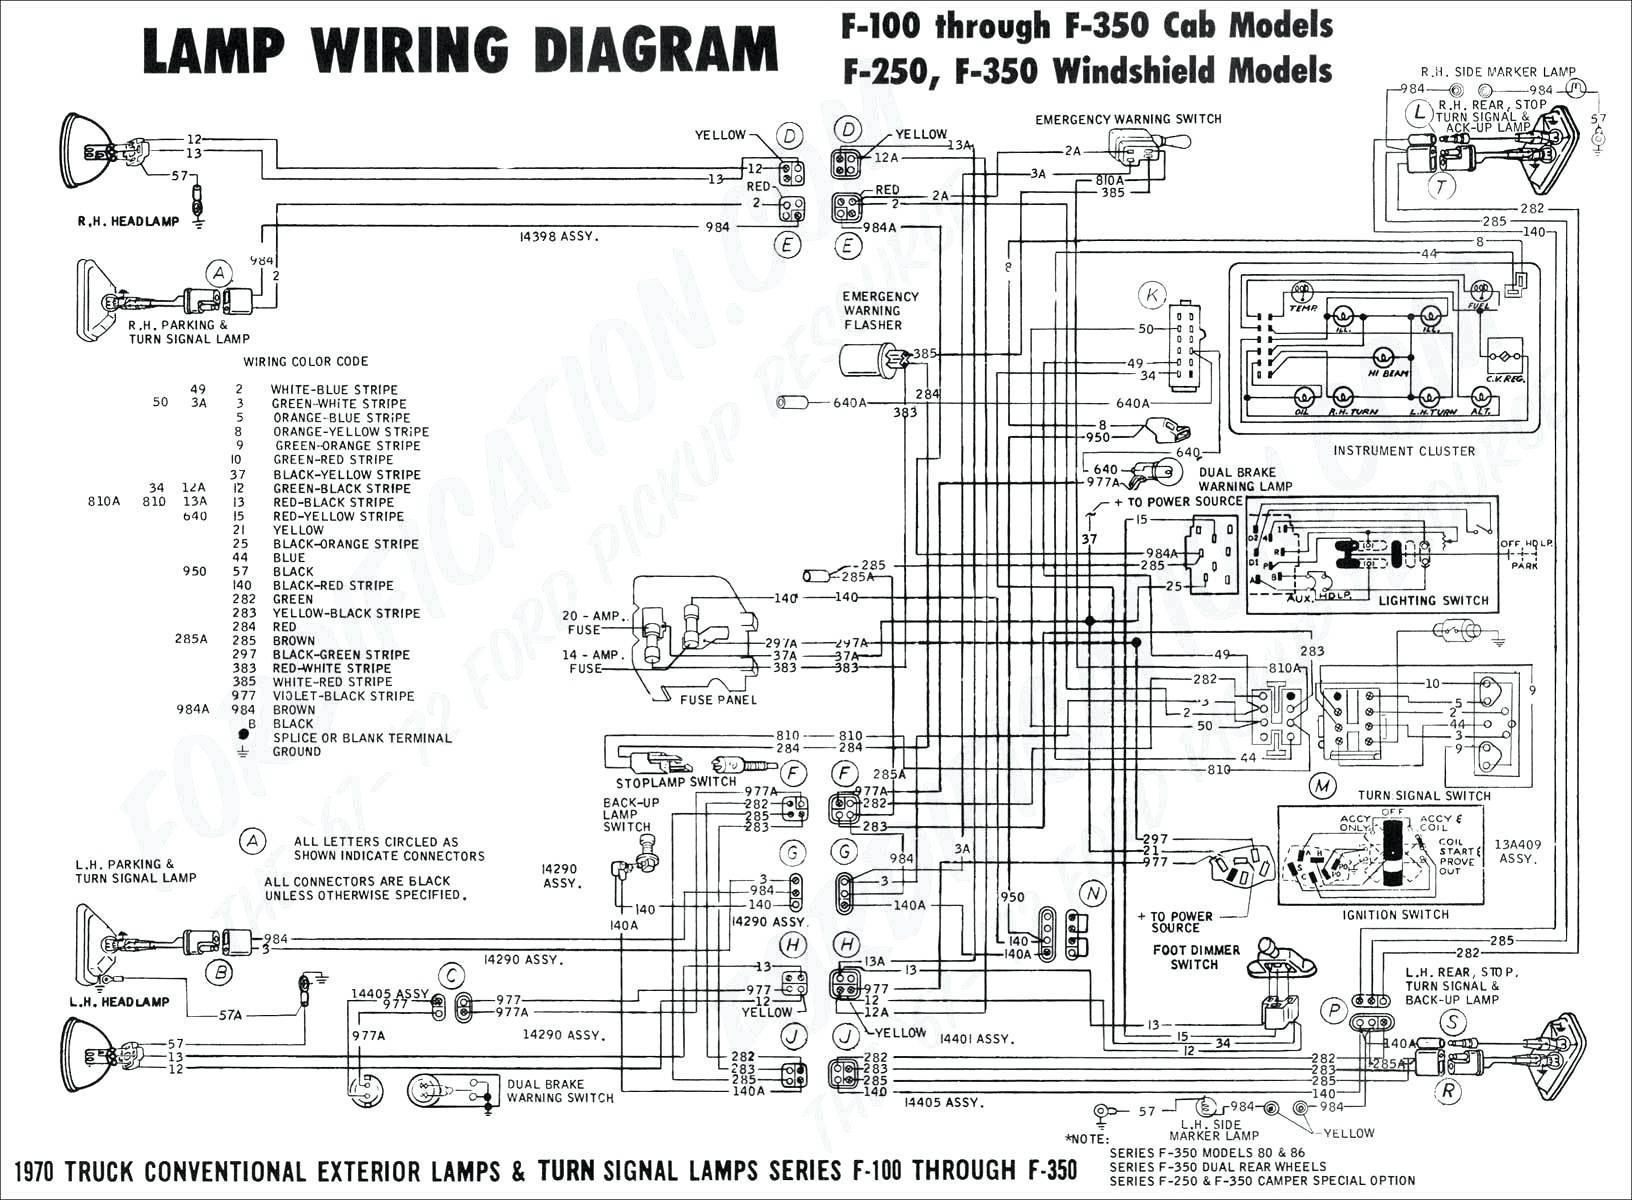 2005 Chevy Silverado Trailer Wiring Diagram Ford Resize Gmc Ideas With F250 5